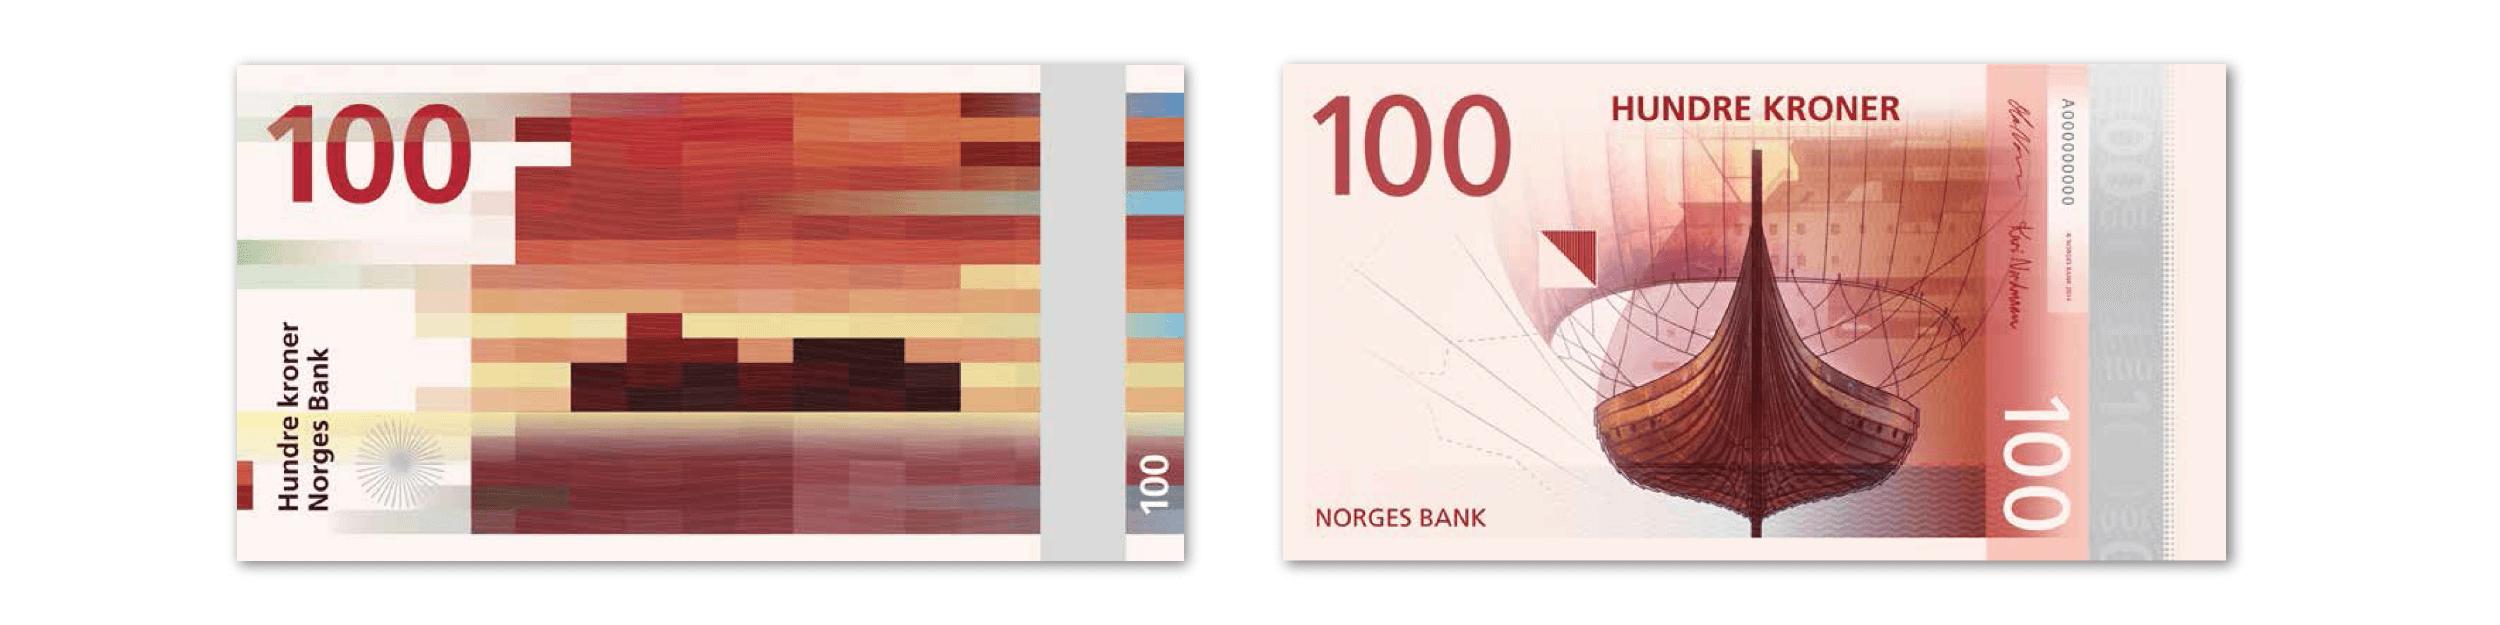 Norway Currency Redesign_100-kroner